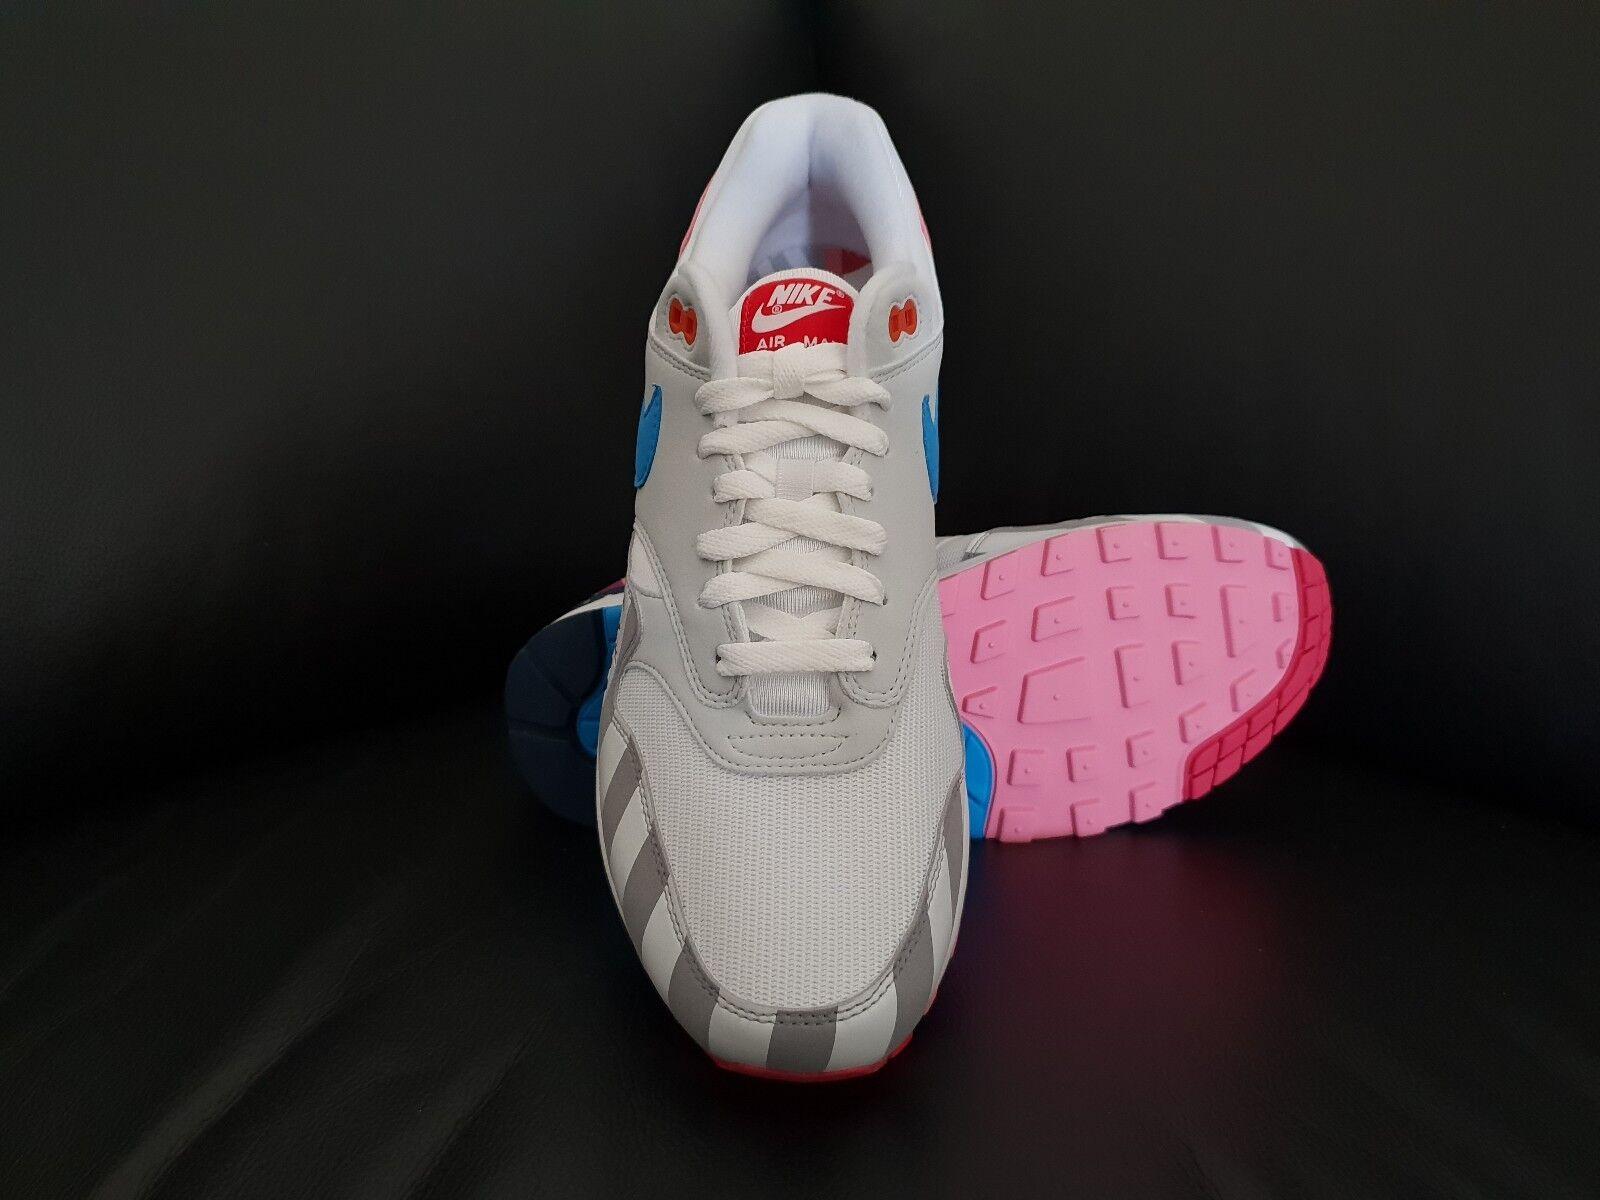 Nike Air Max Max Max 1 Parra, White Multi color, (AT3057-100), 10 US 92de90